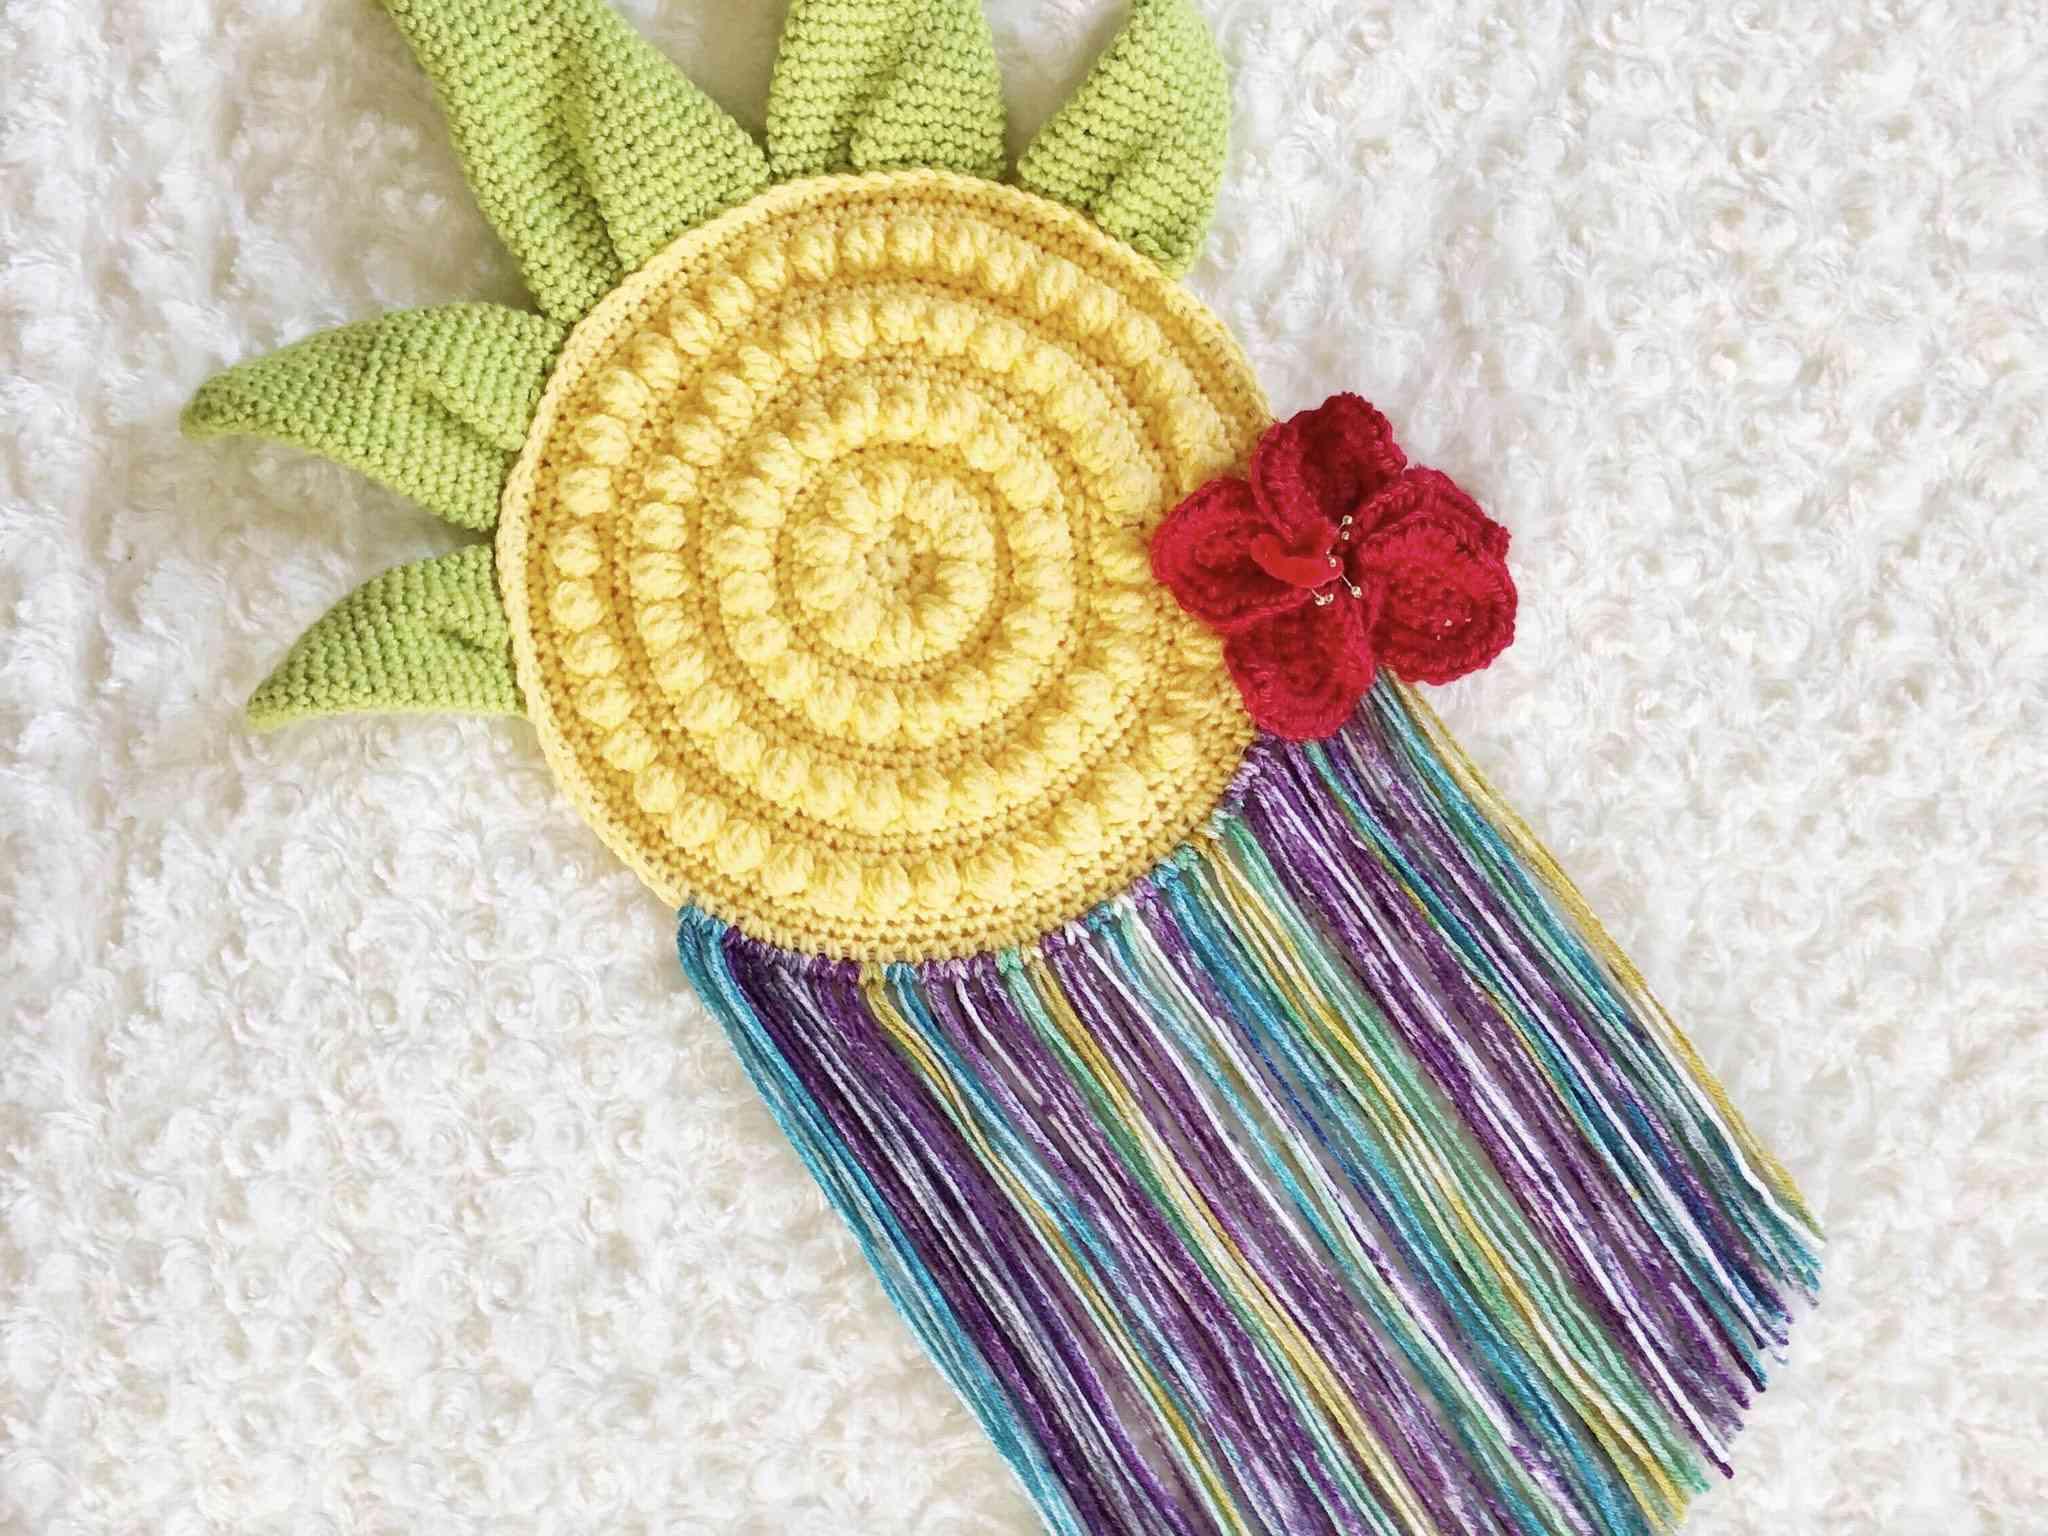 Crochet Pineapple Wall Hanging